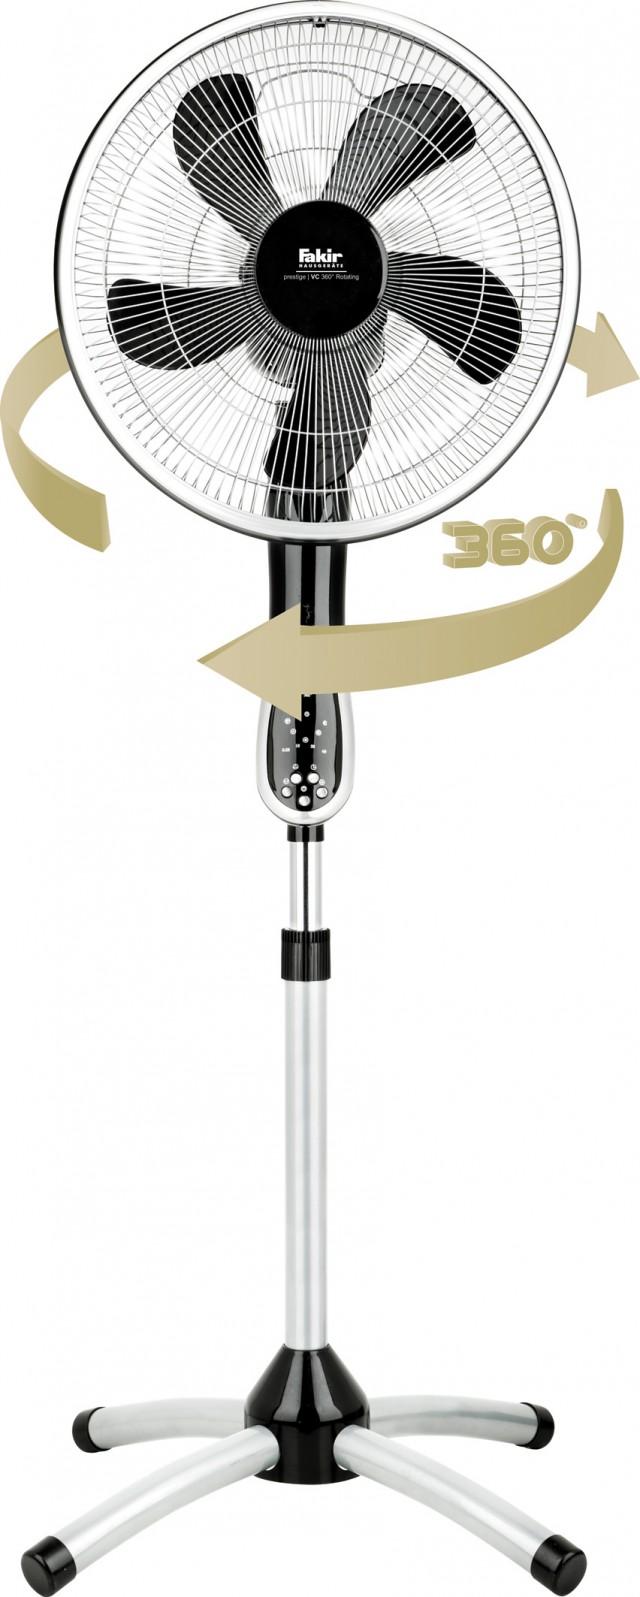 Fakir Rotating 360 mit 360-Grad-Rotation.